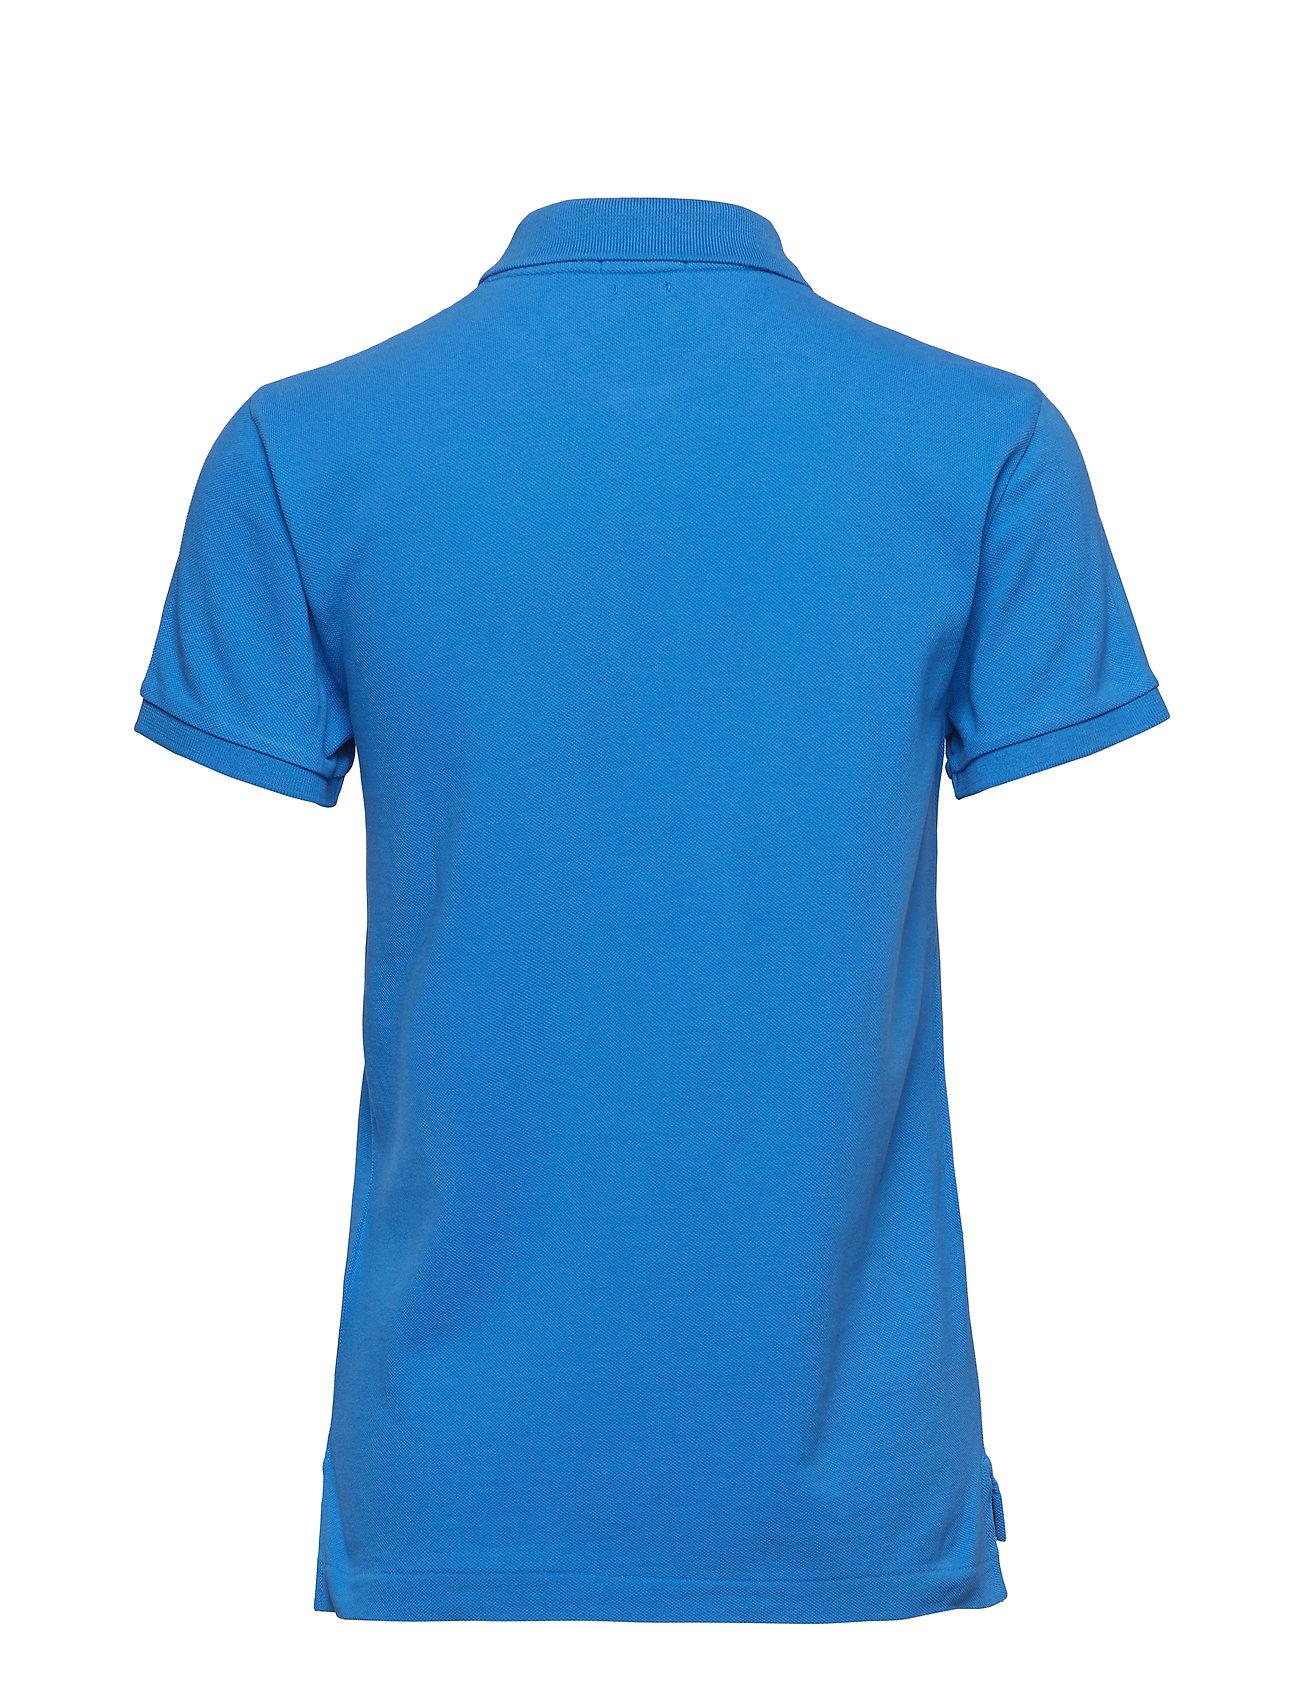 Polo Fit Shirtcolby Lauren Classic Mesh BlueRalph 8nwOPk0X